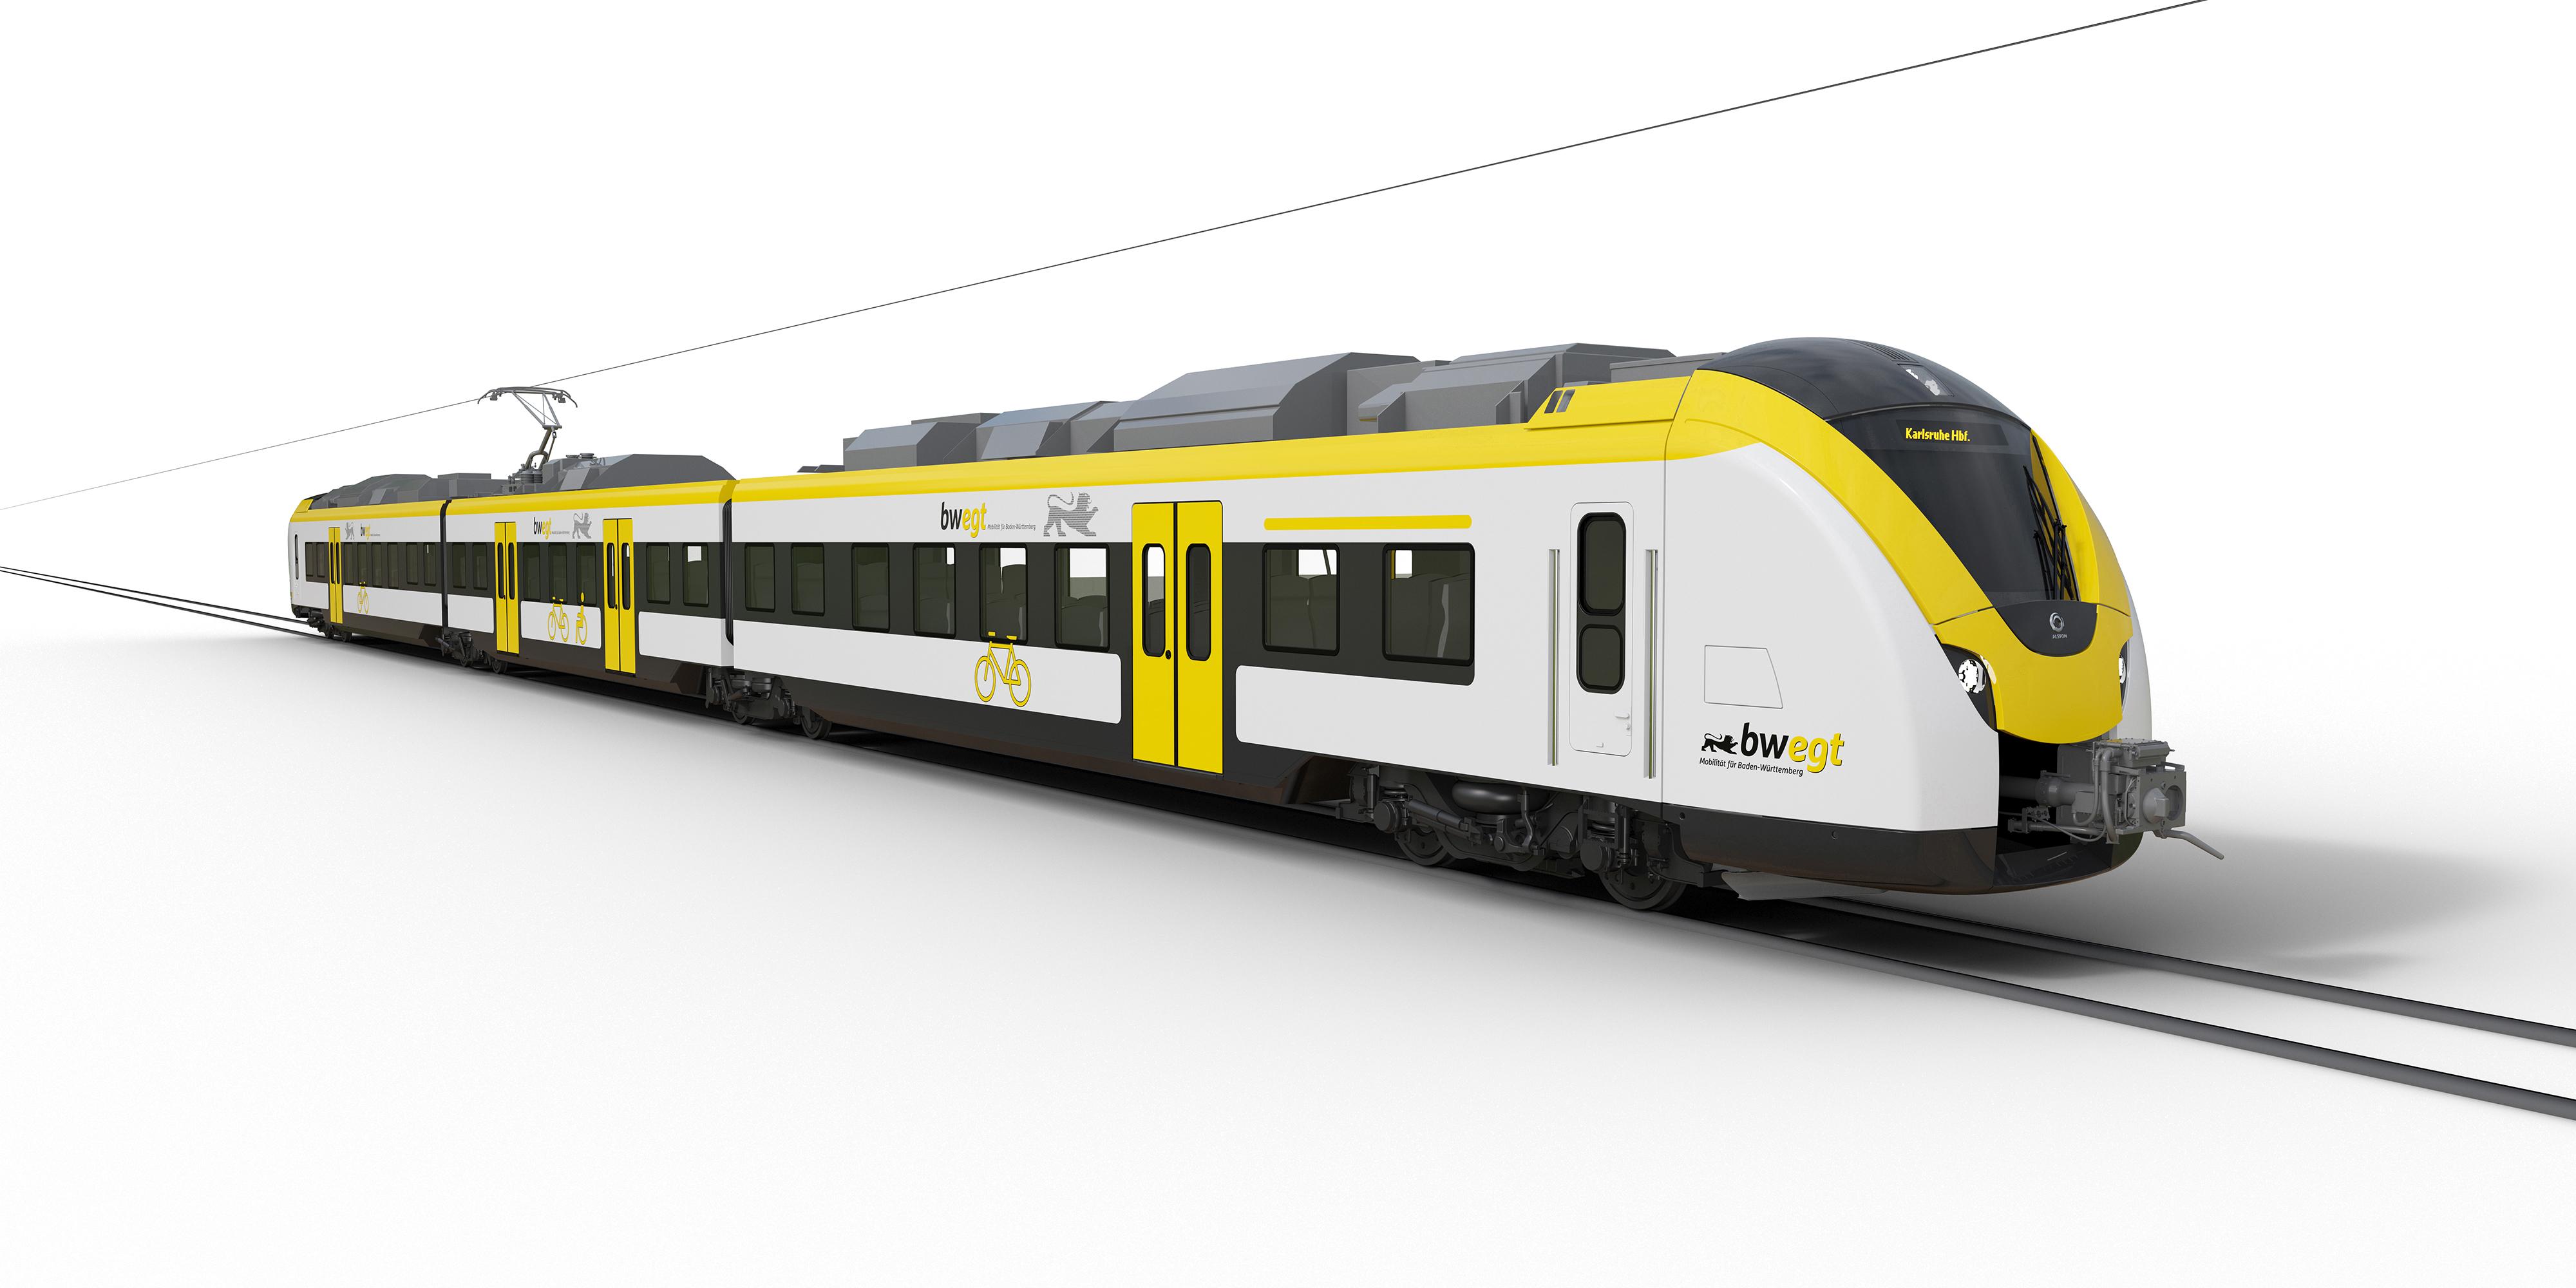 Alstom Coradia Continental for DB Regio Baden Wuerttemberg